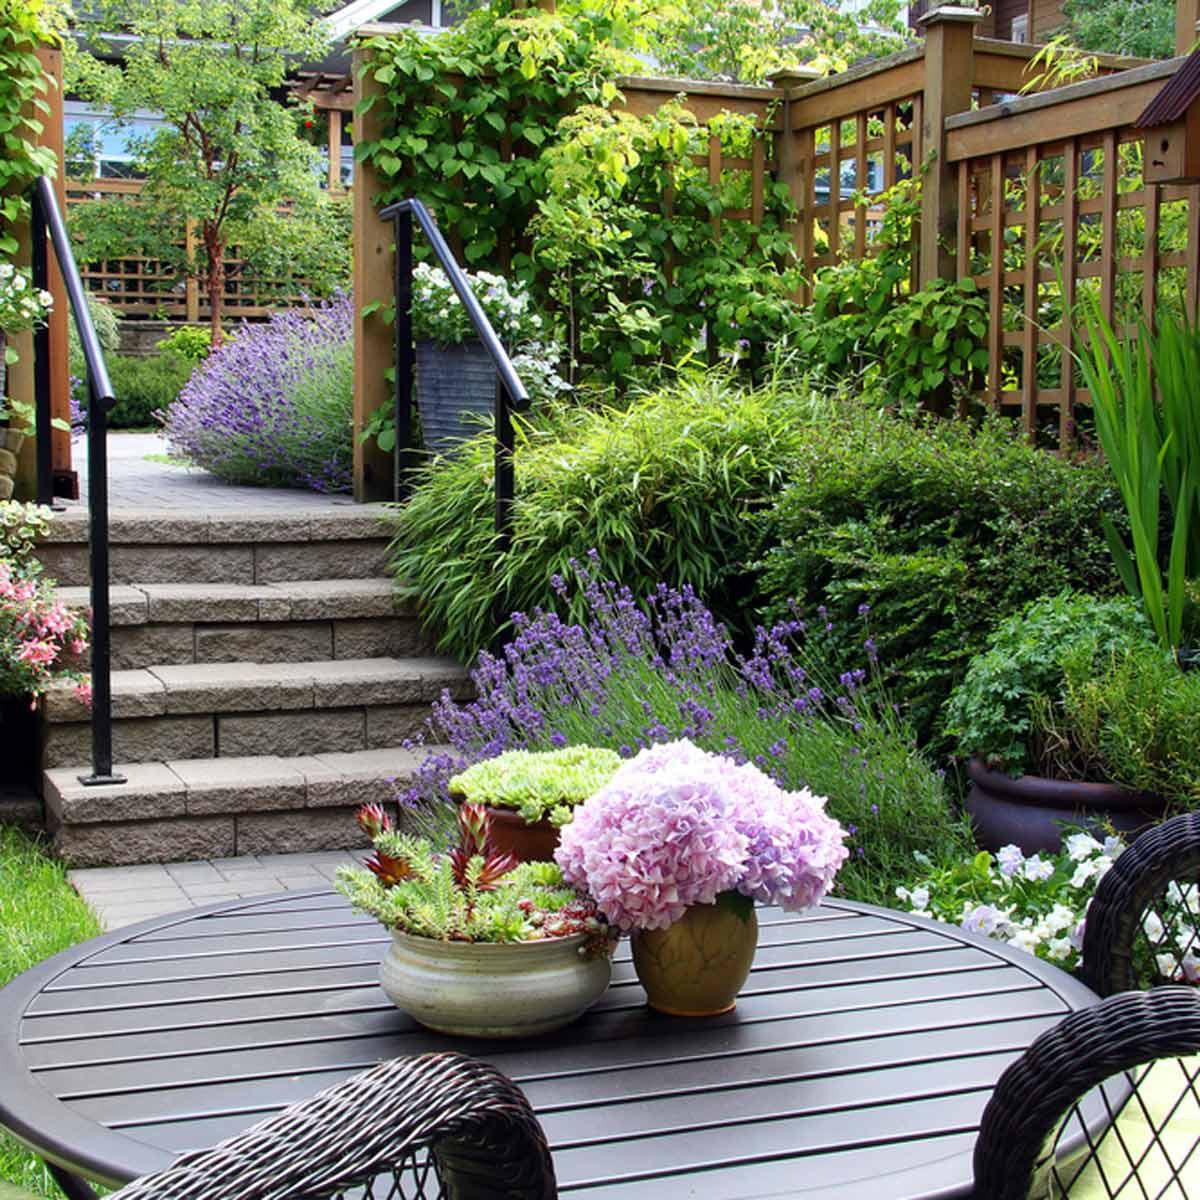 Backyard Ideas For Small Yard  14 Small Yard Landscaping Ideas to Impress